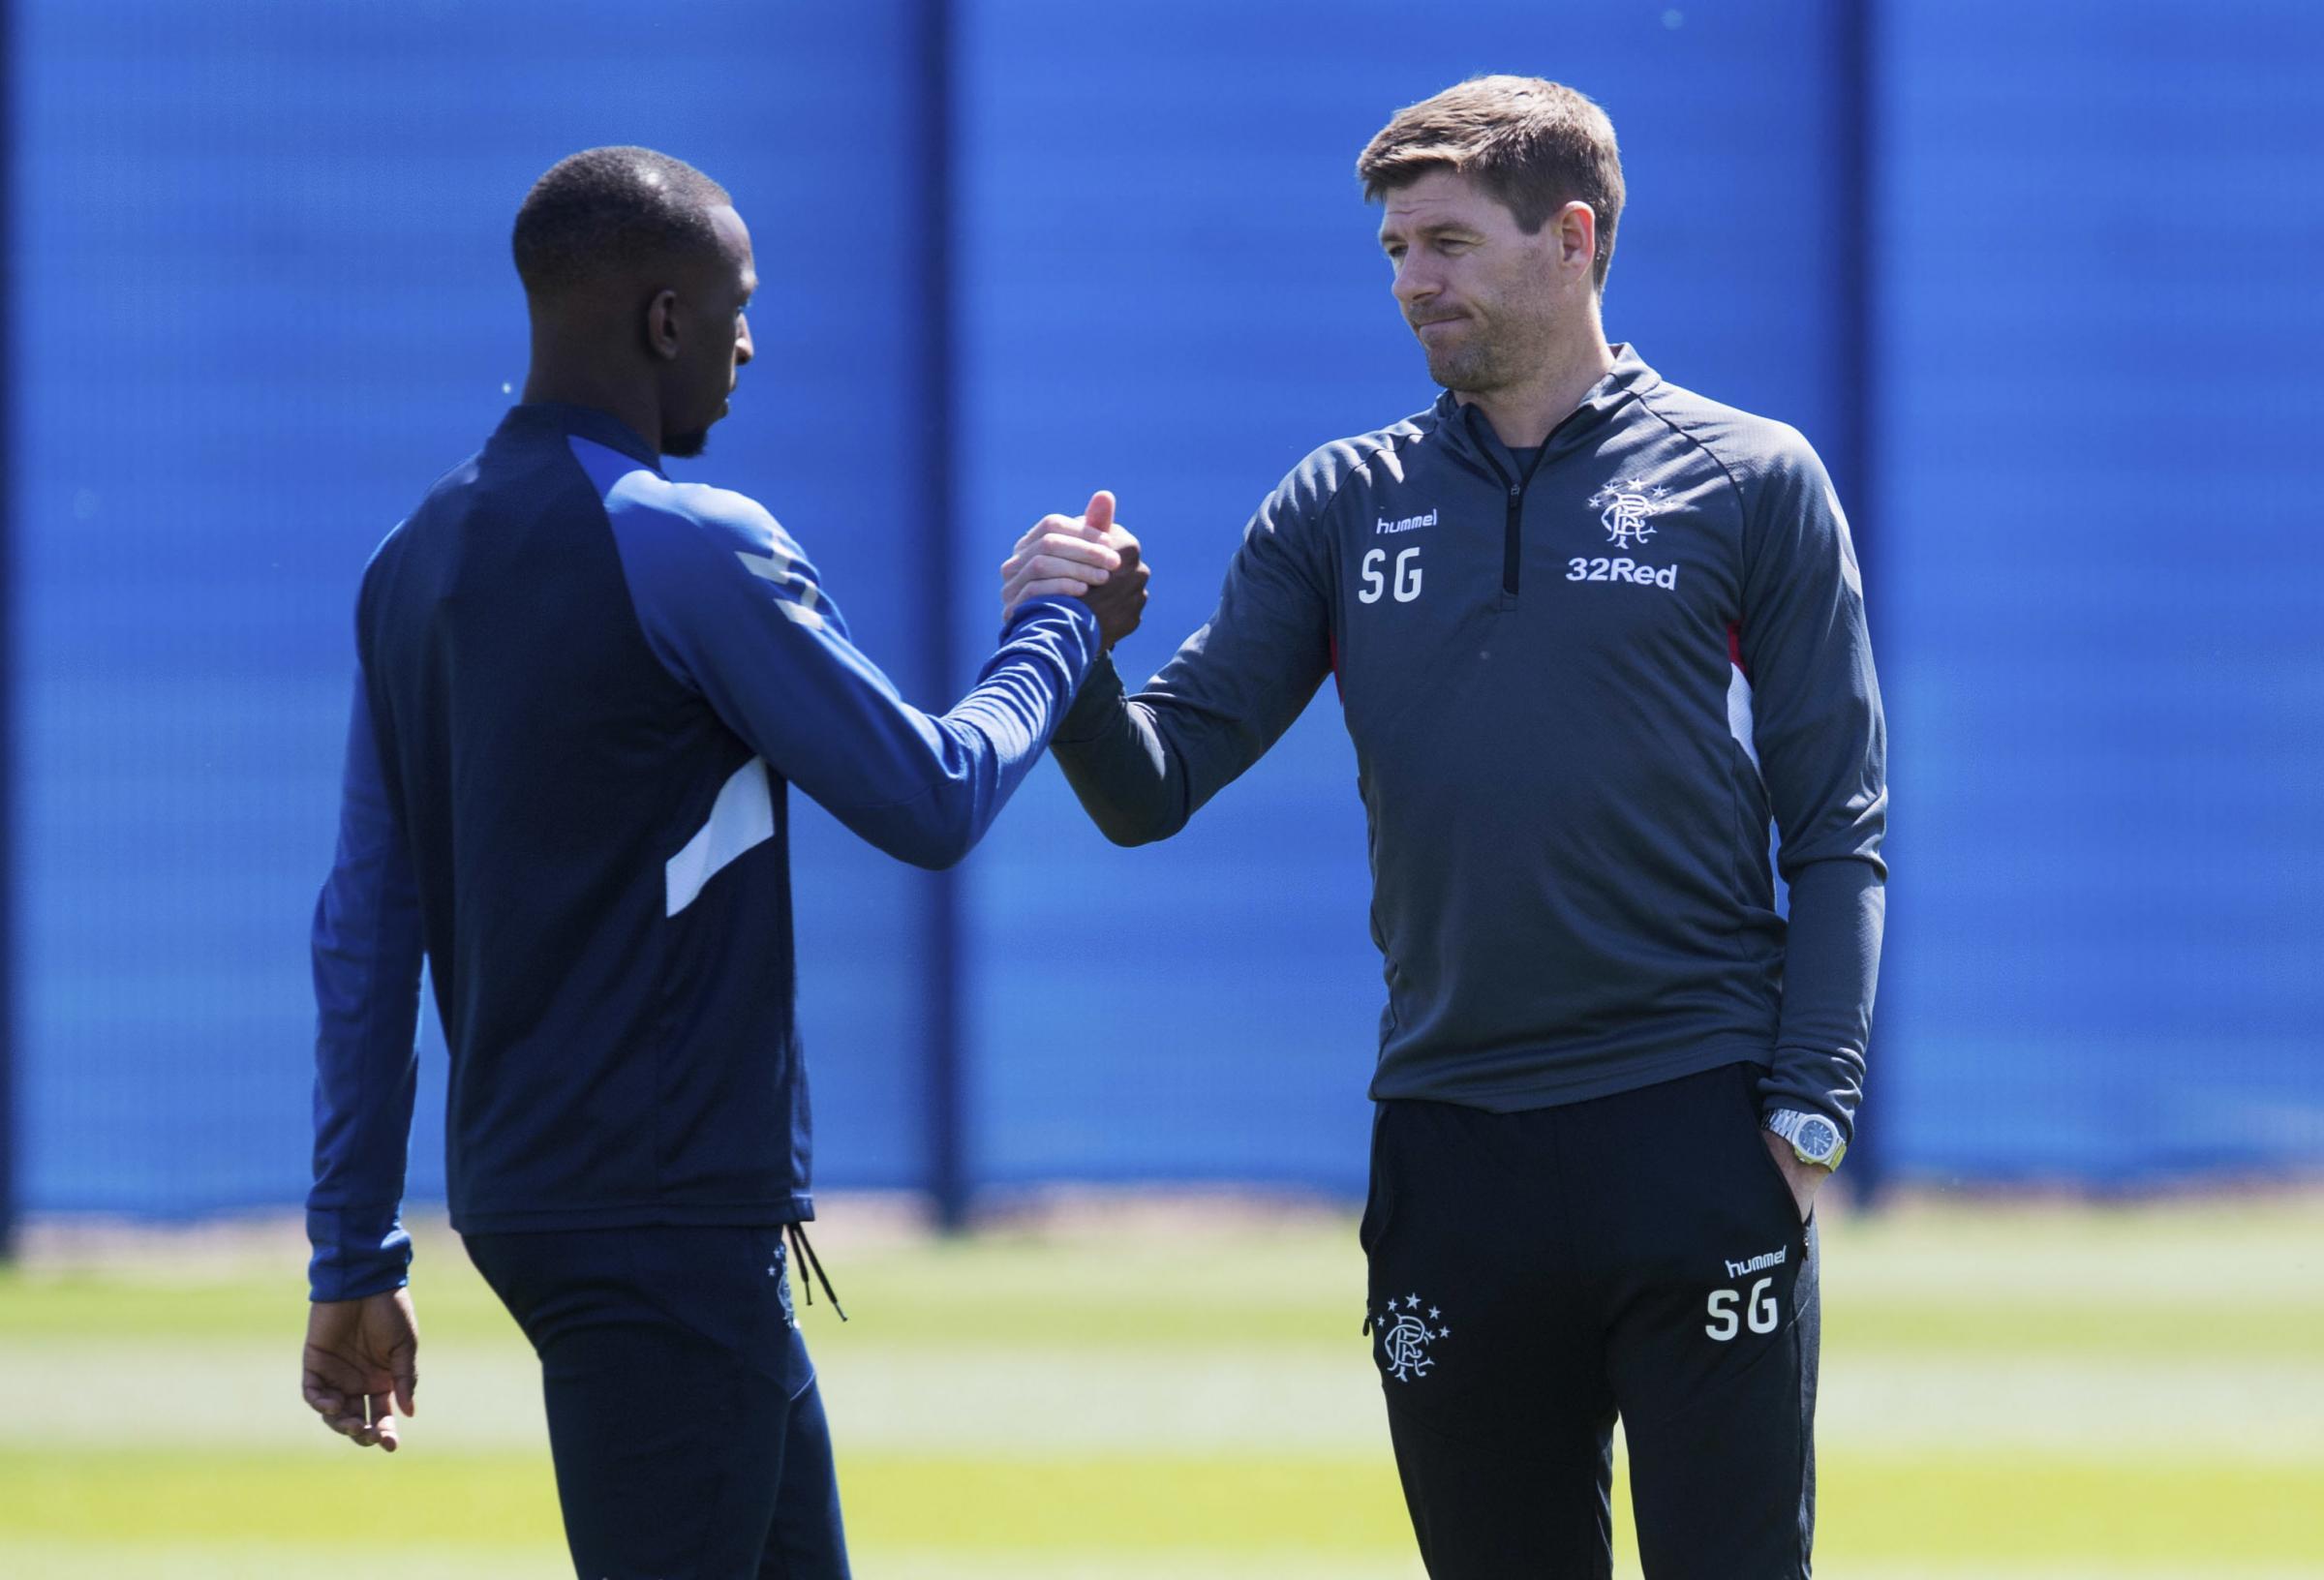 Rangers midfielder Glen Kamara an £8million January target for English sides